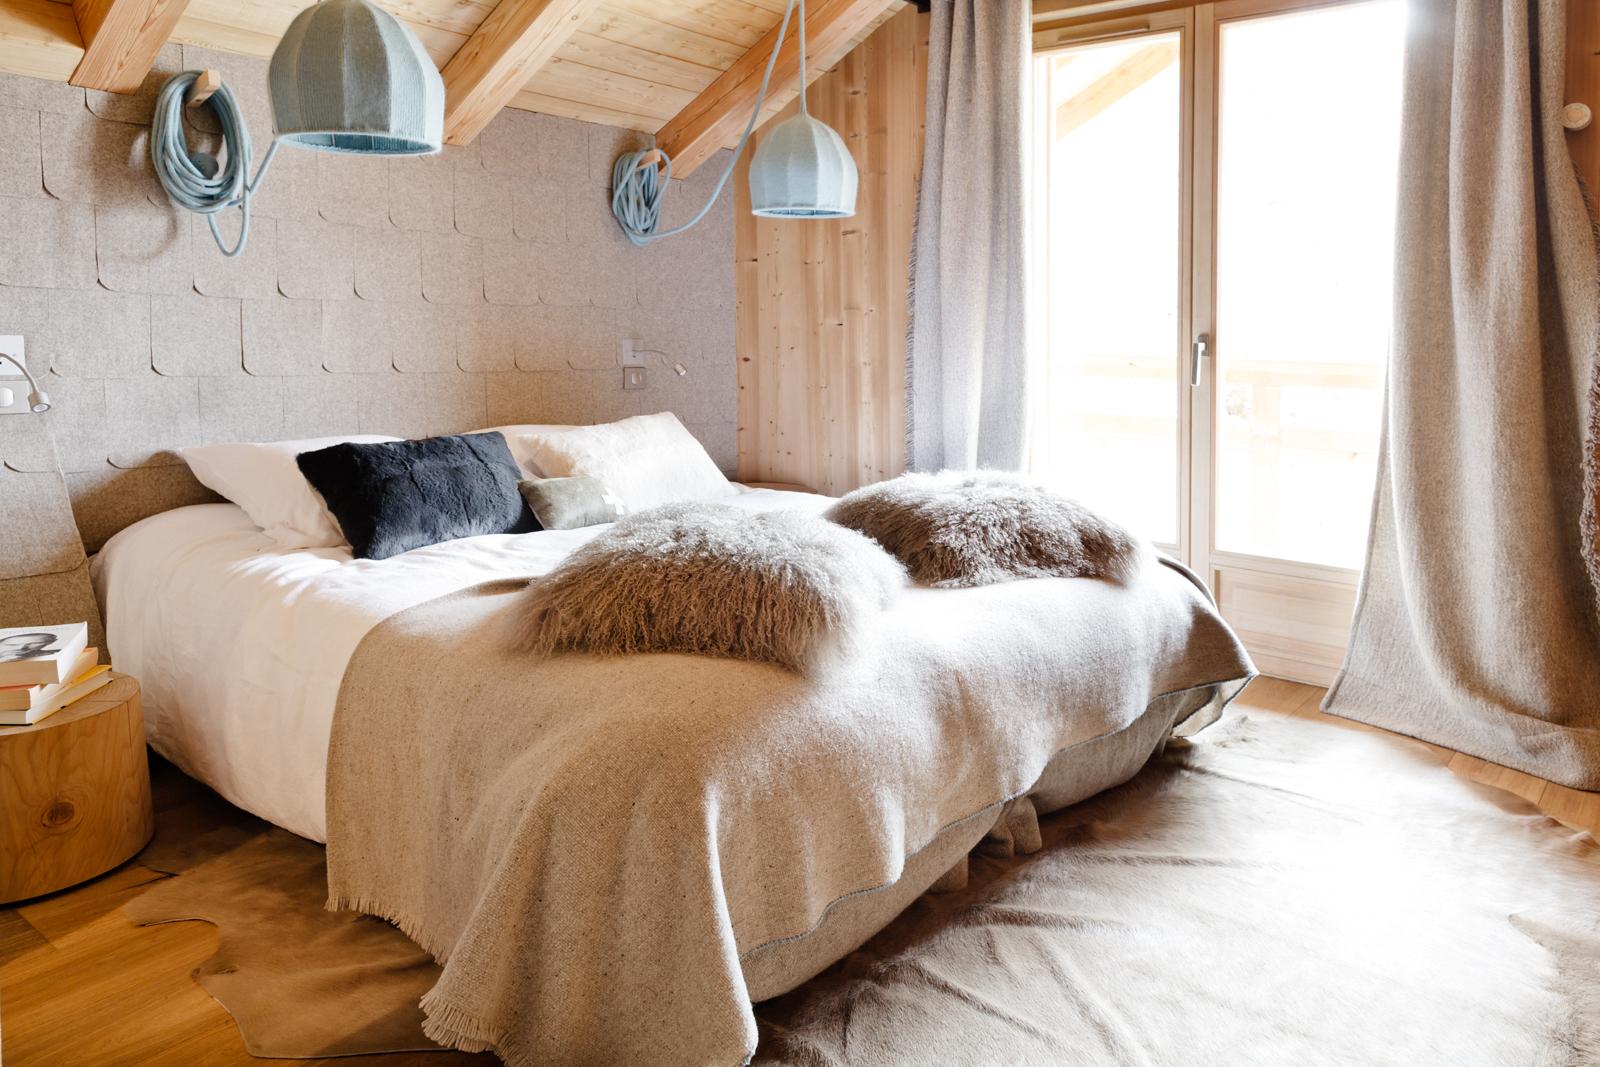 Serre Chevalier Luxury Chalet Rentals ski slopes concierge services ...